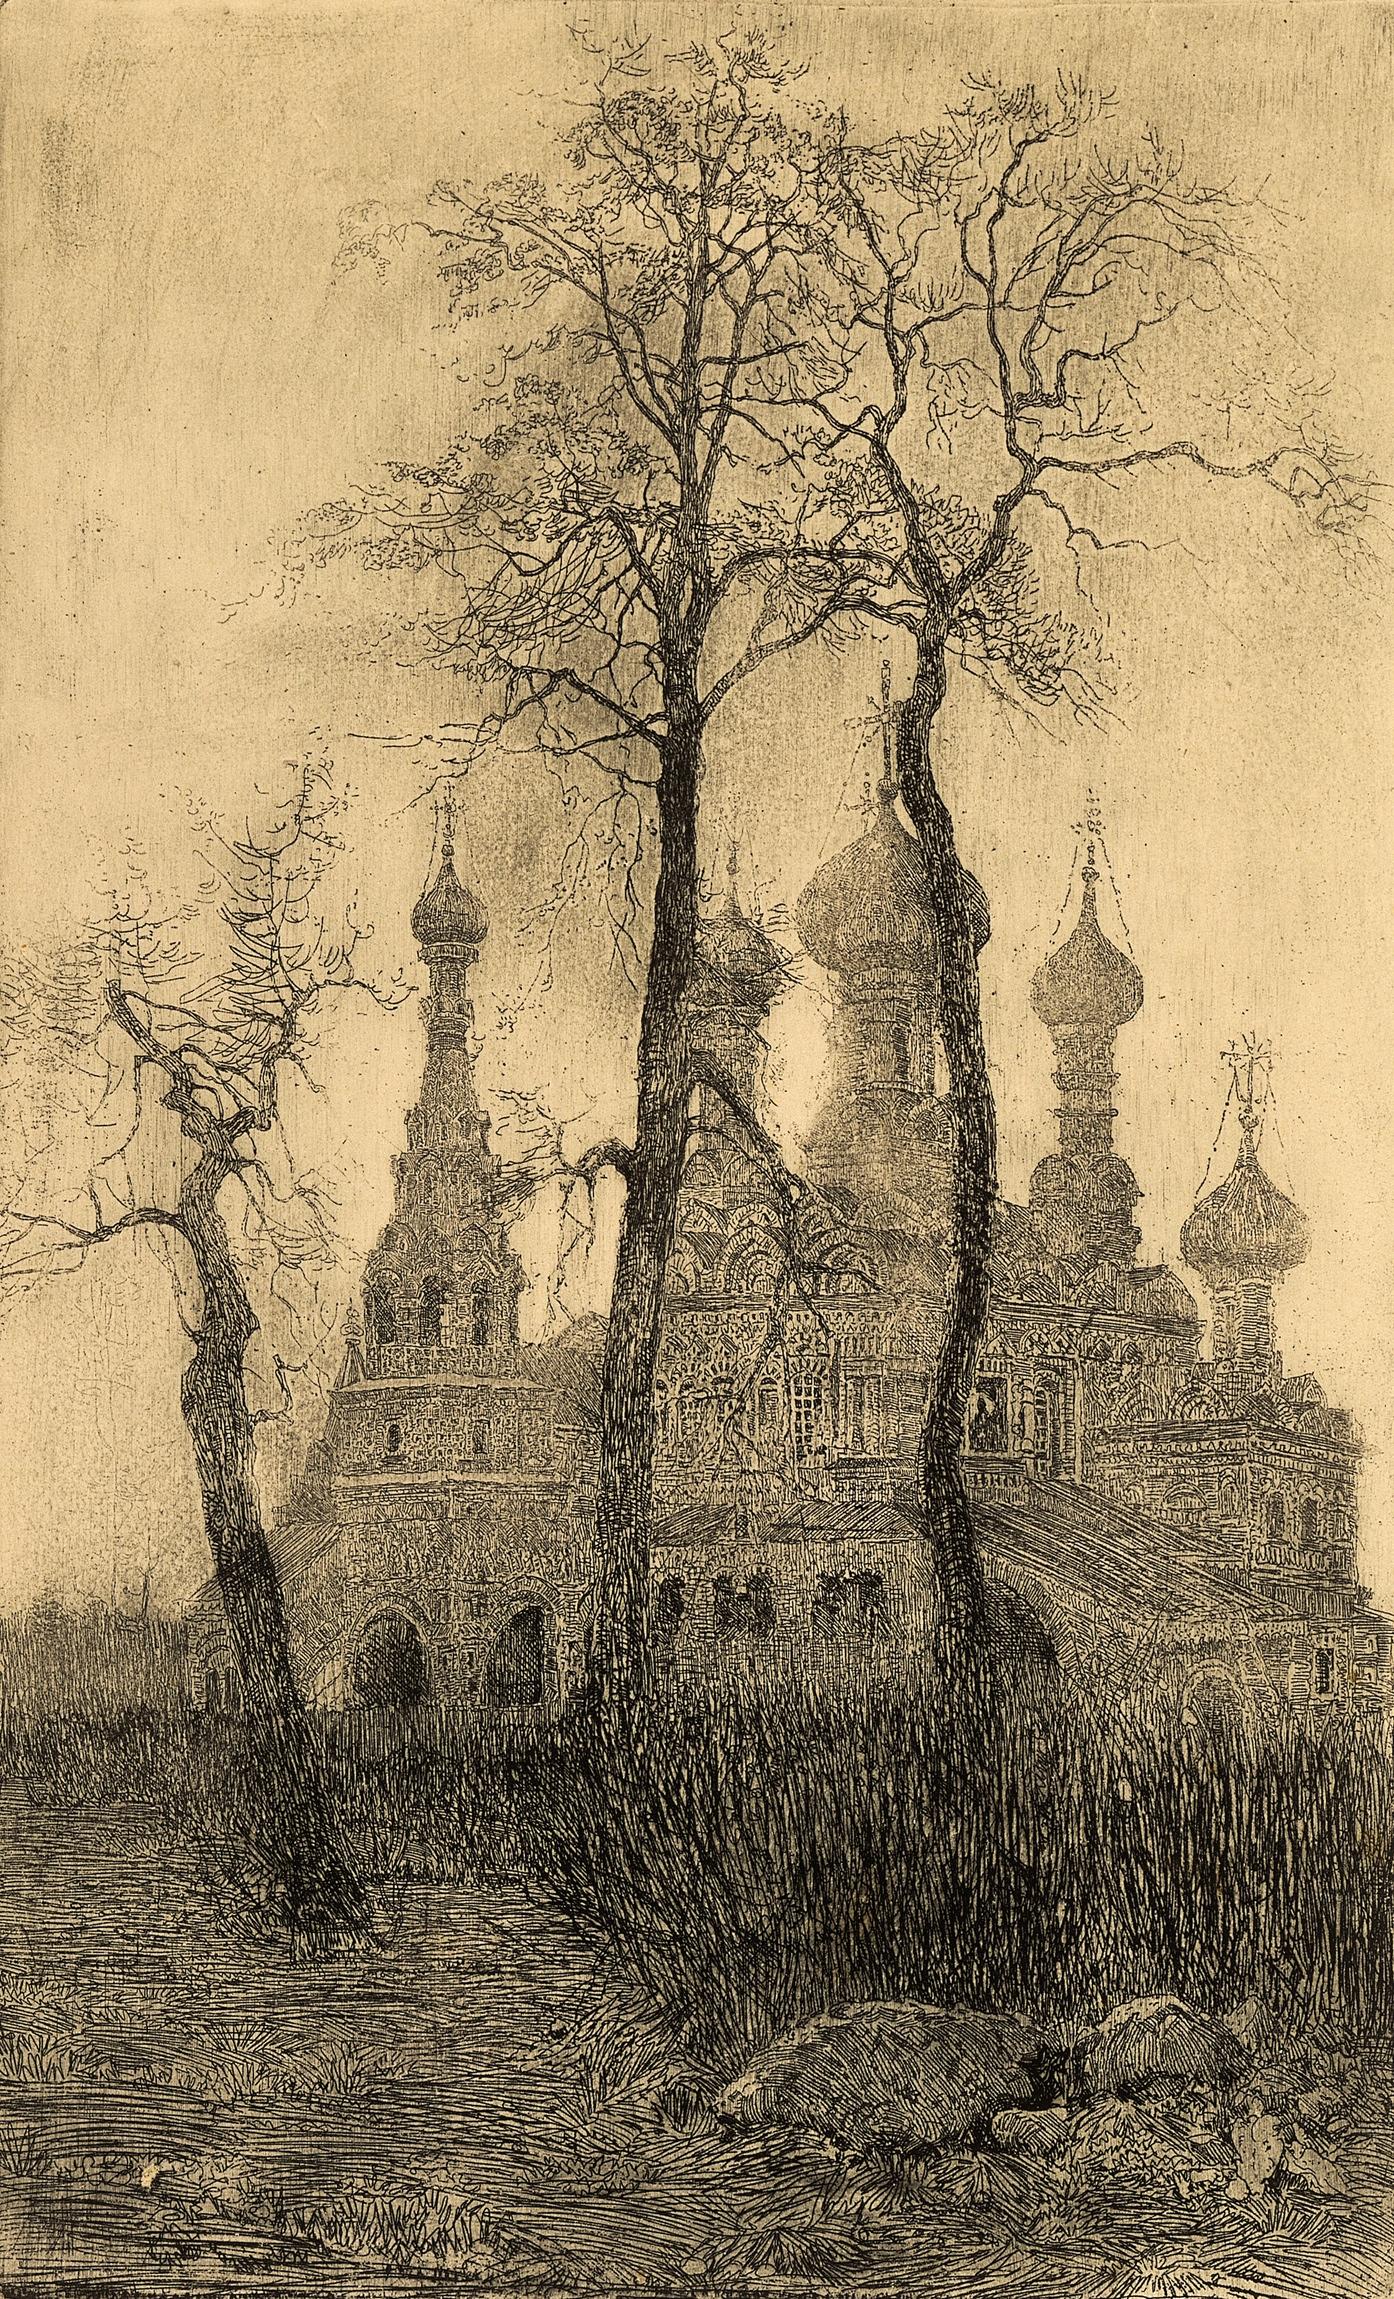 Moscow. Church in Ostankino